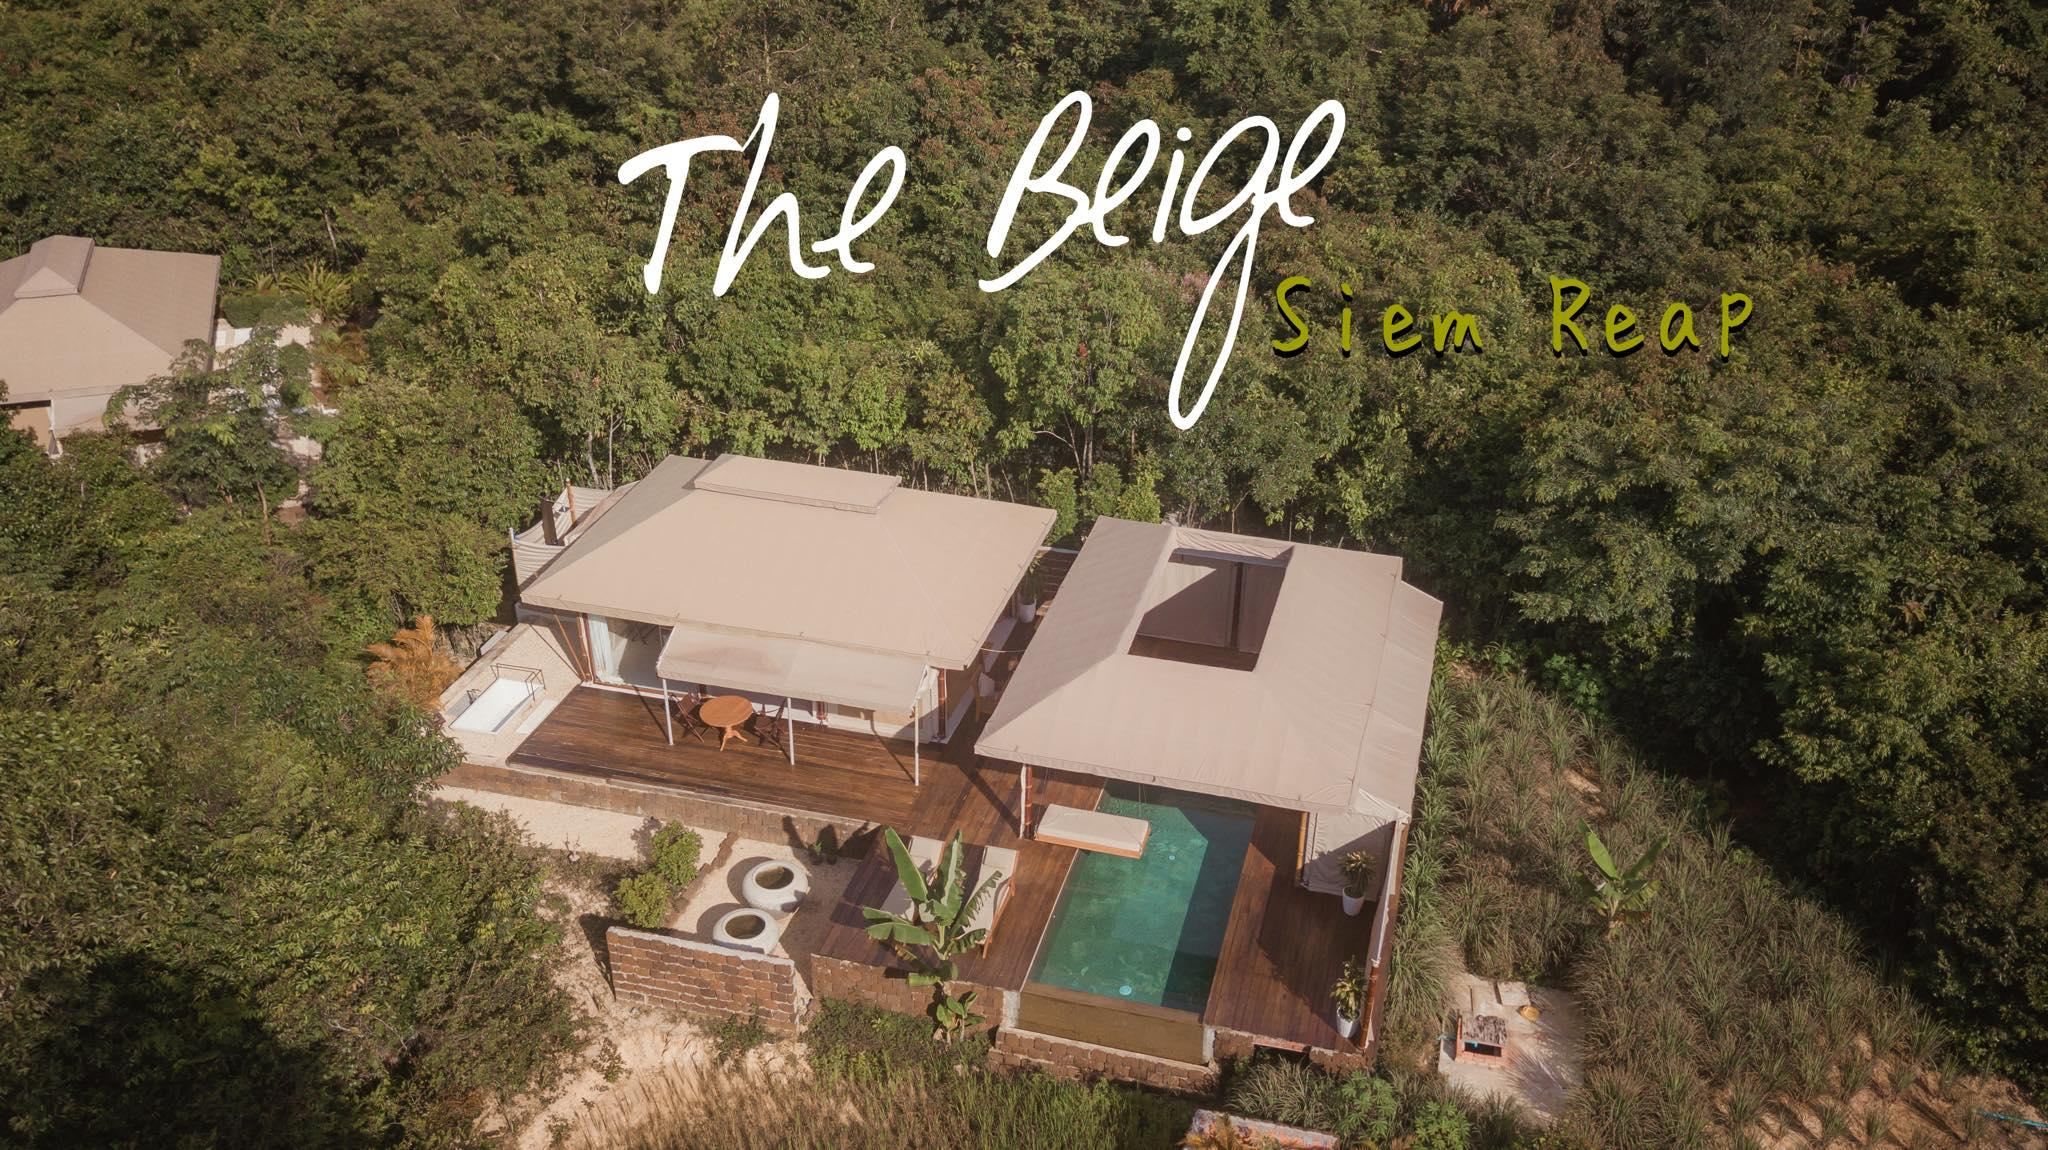 The BEIGE រីសត